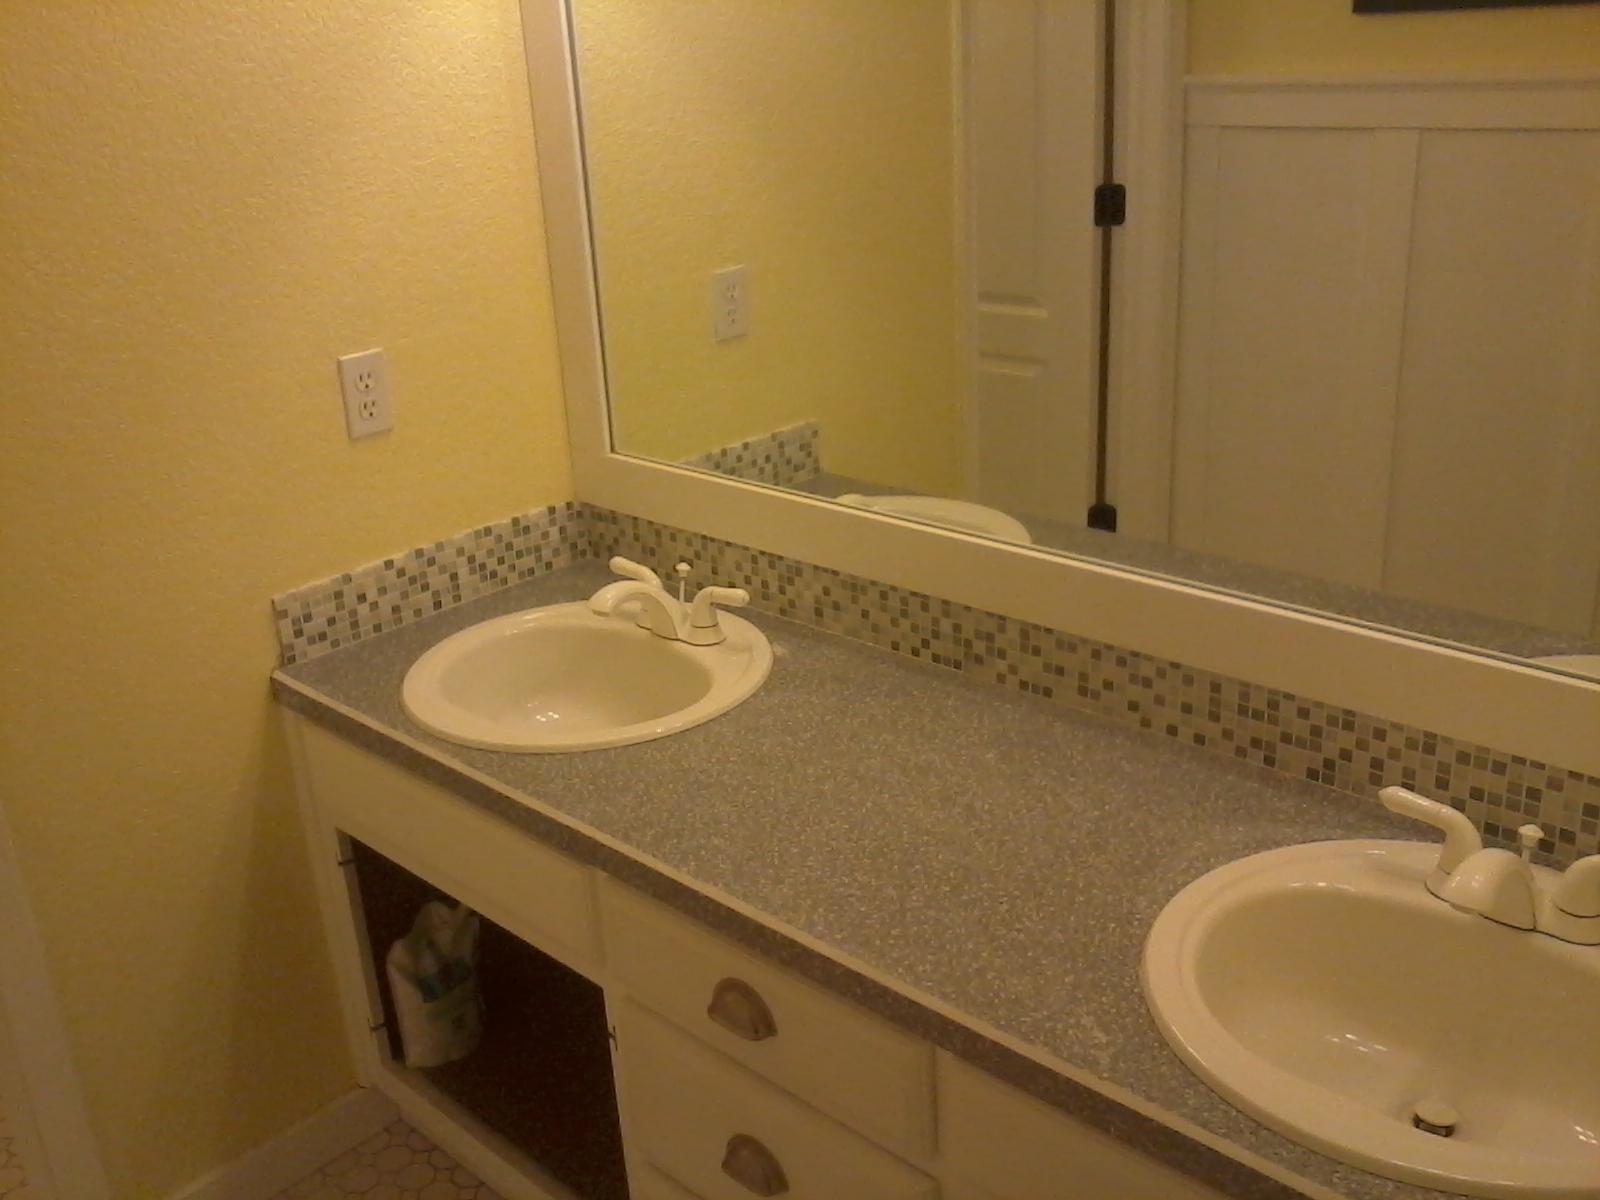 mosaic tile for bathroom backsplash  Front Porch Cozy